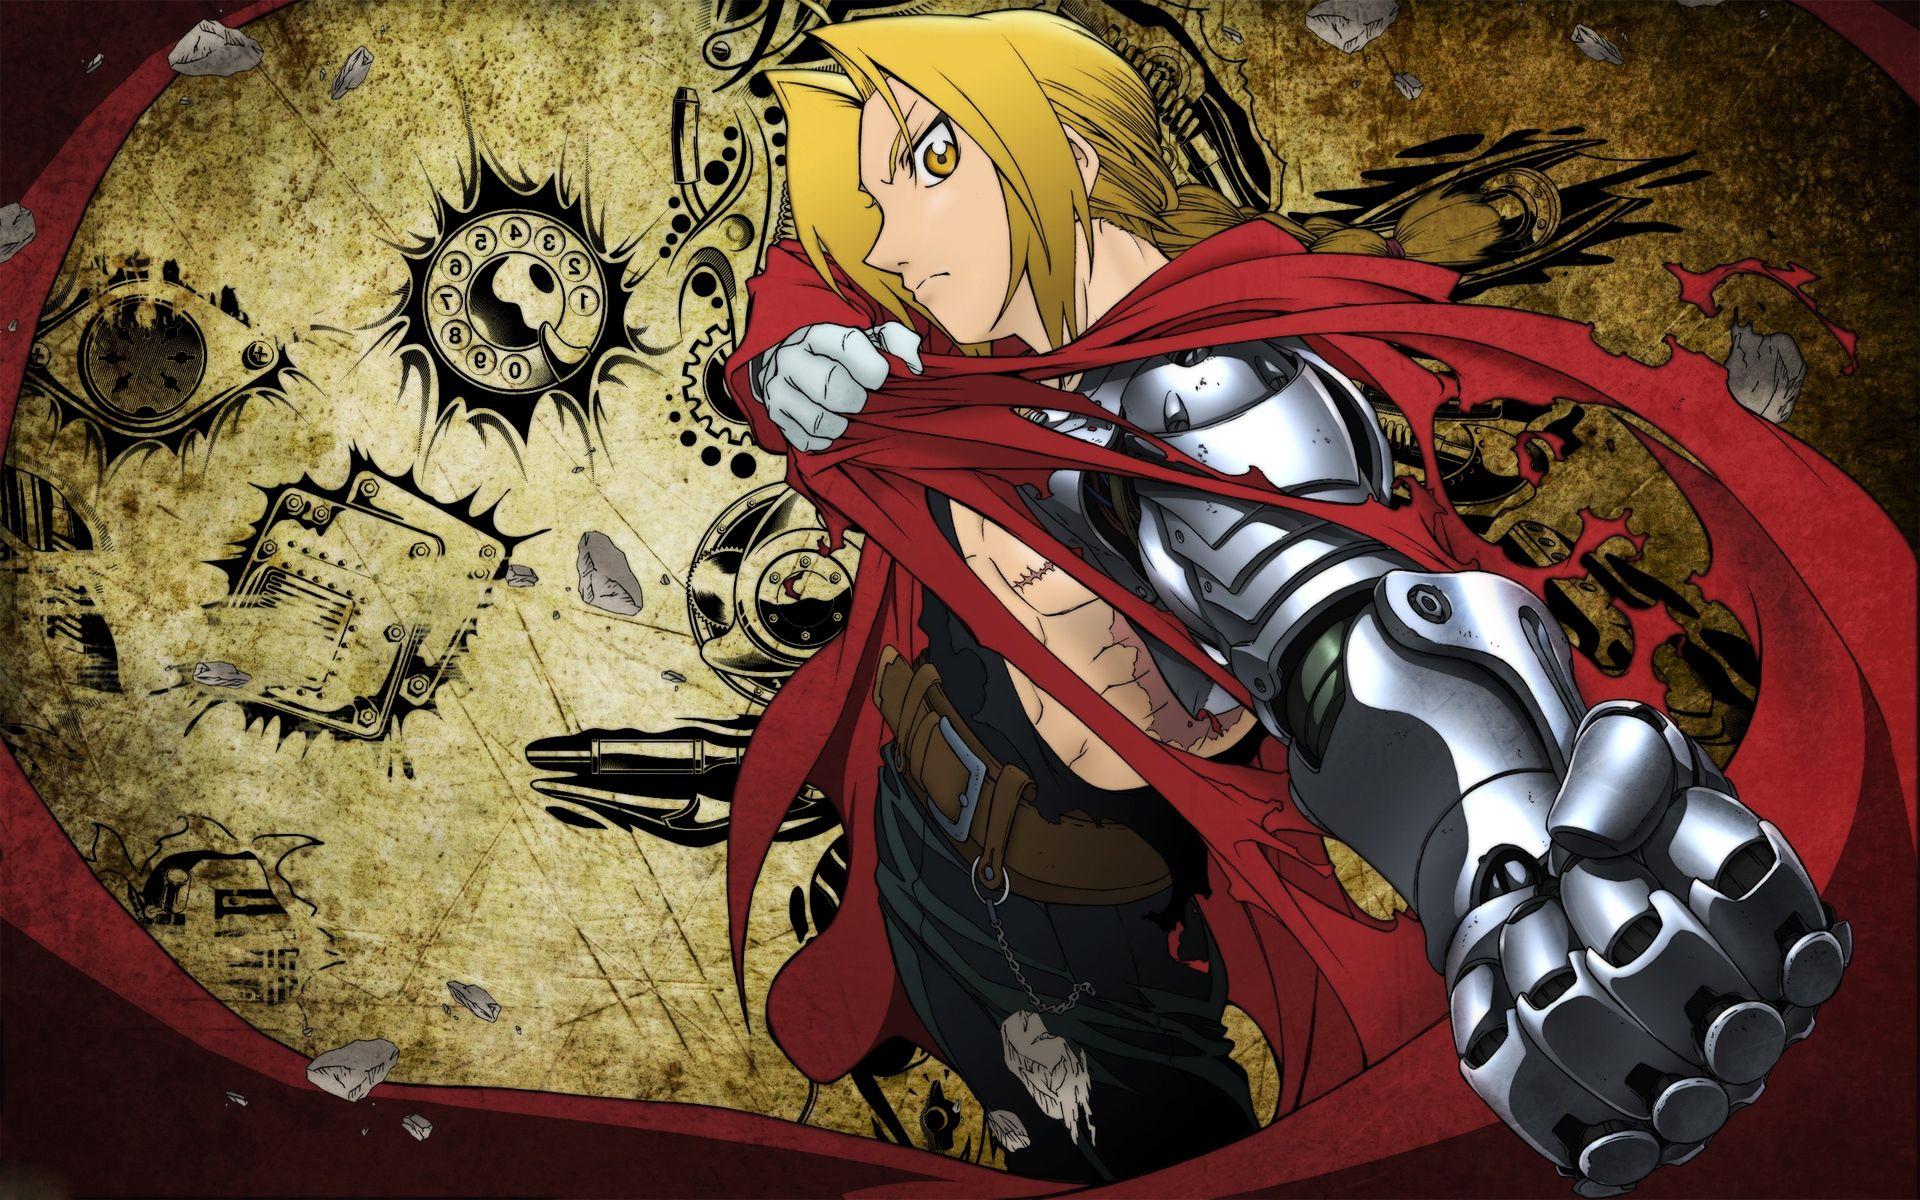 Fullmetal Alchemist wallpaper – Must Have For Metal Alchemist Fans Everywhere!